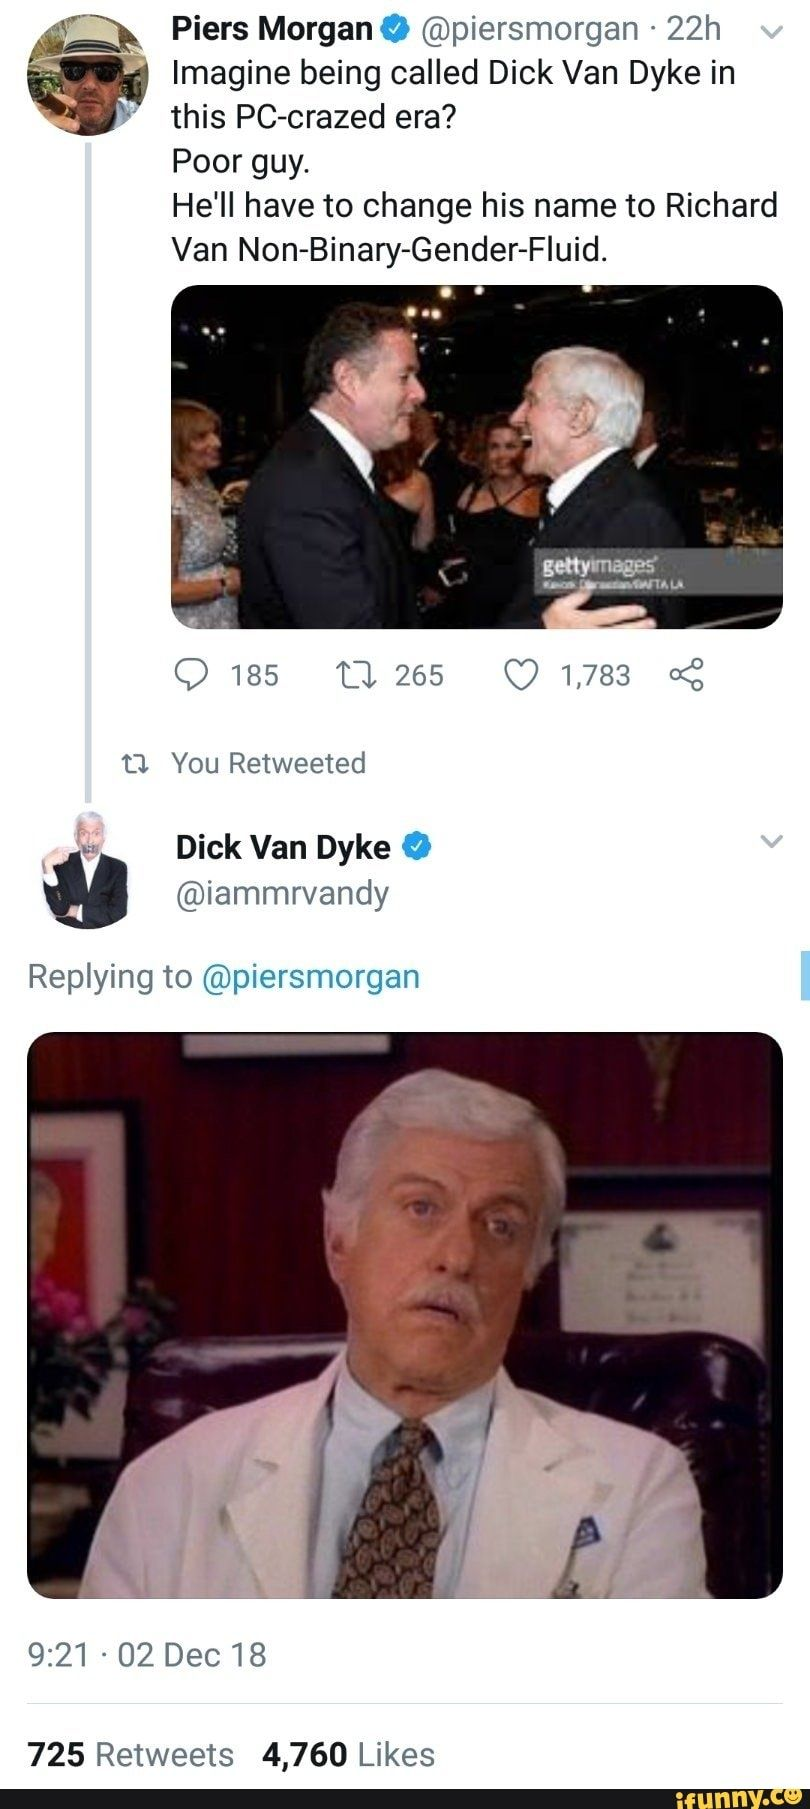 Politically Correct Meme On Sexuality